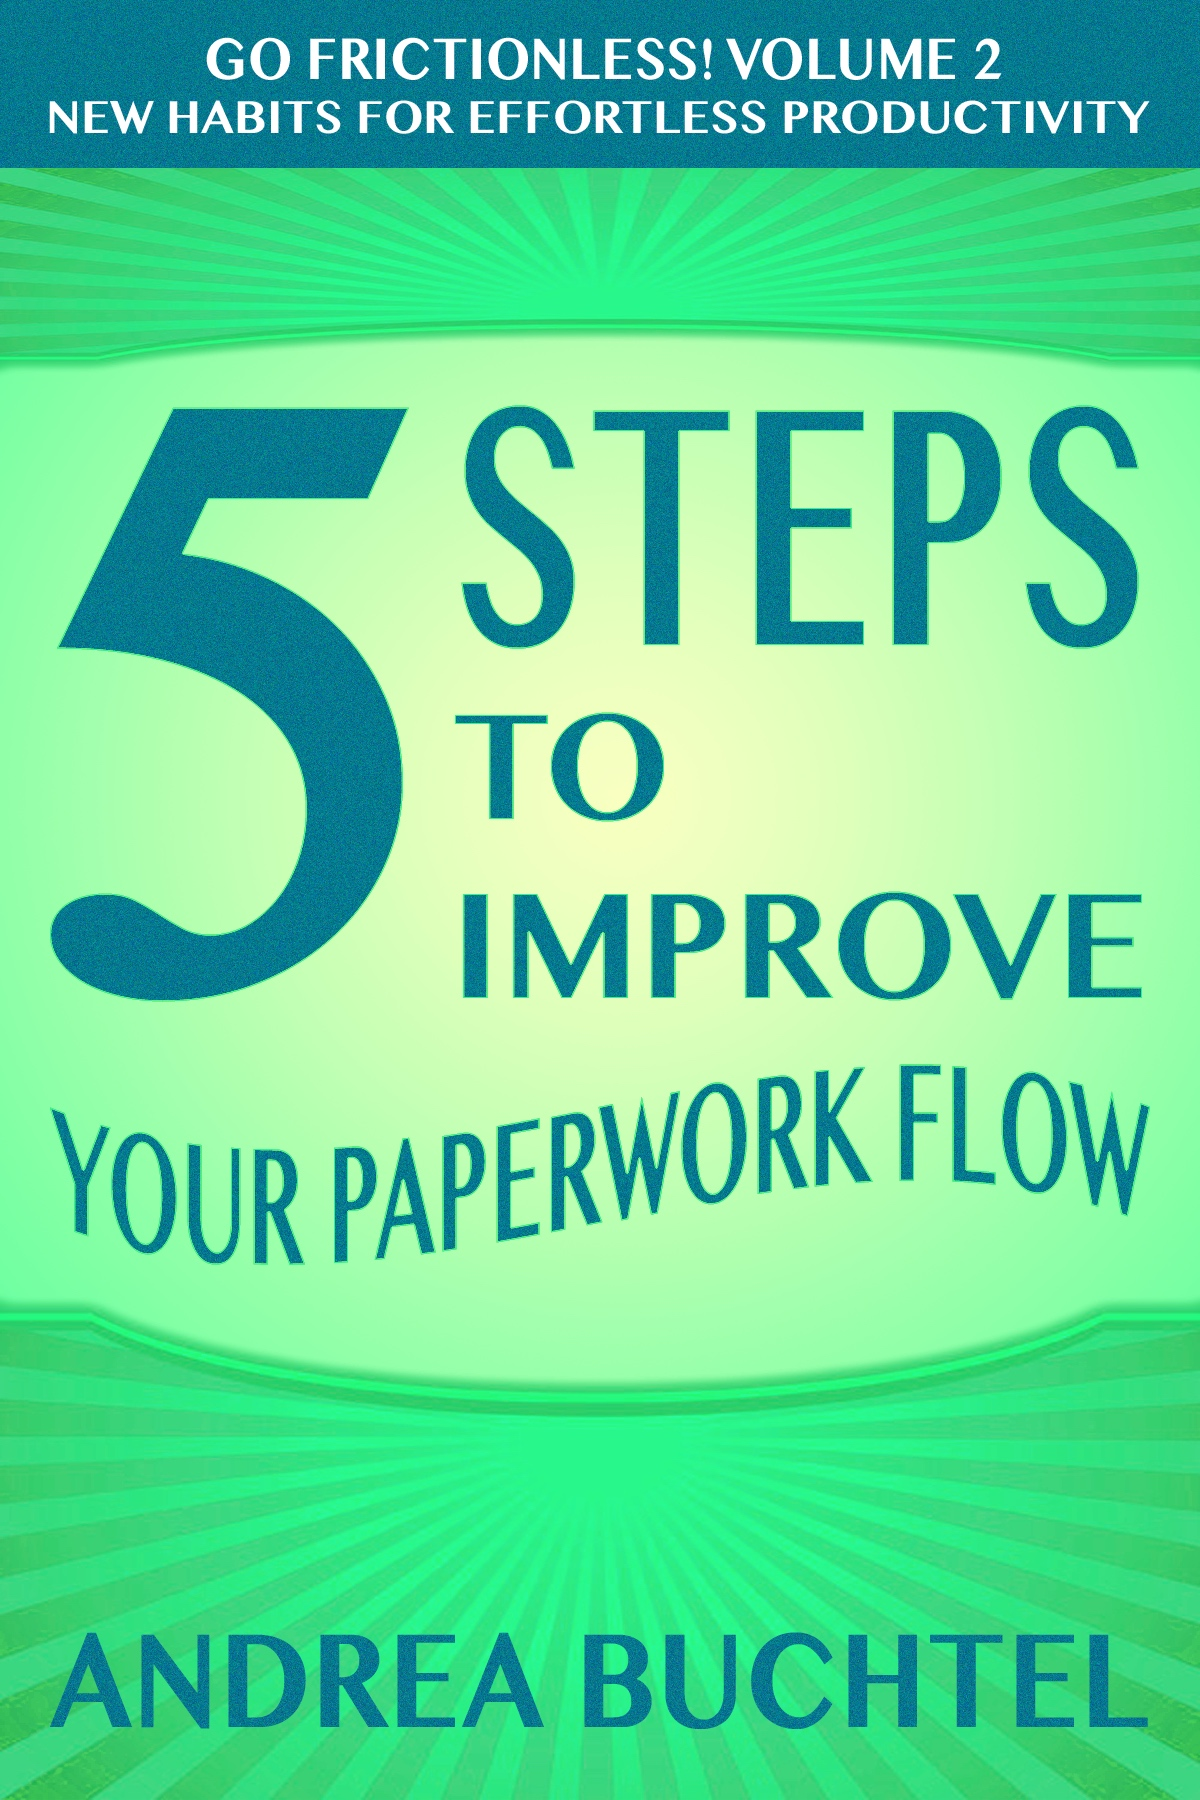 5 Steps to Improve Your Paperwork Flow - Andrea Buchtel